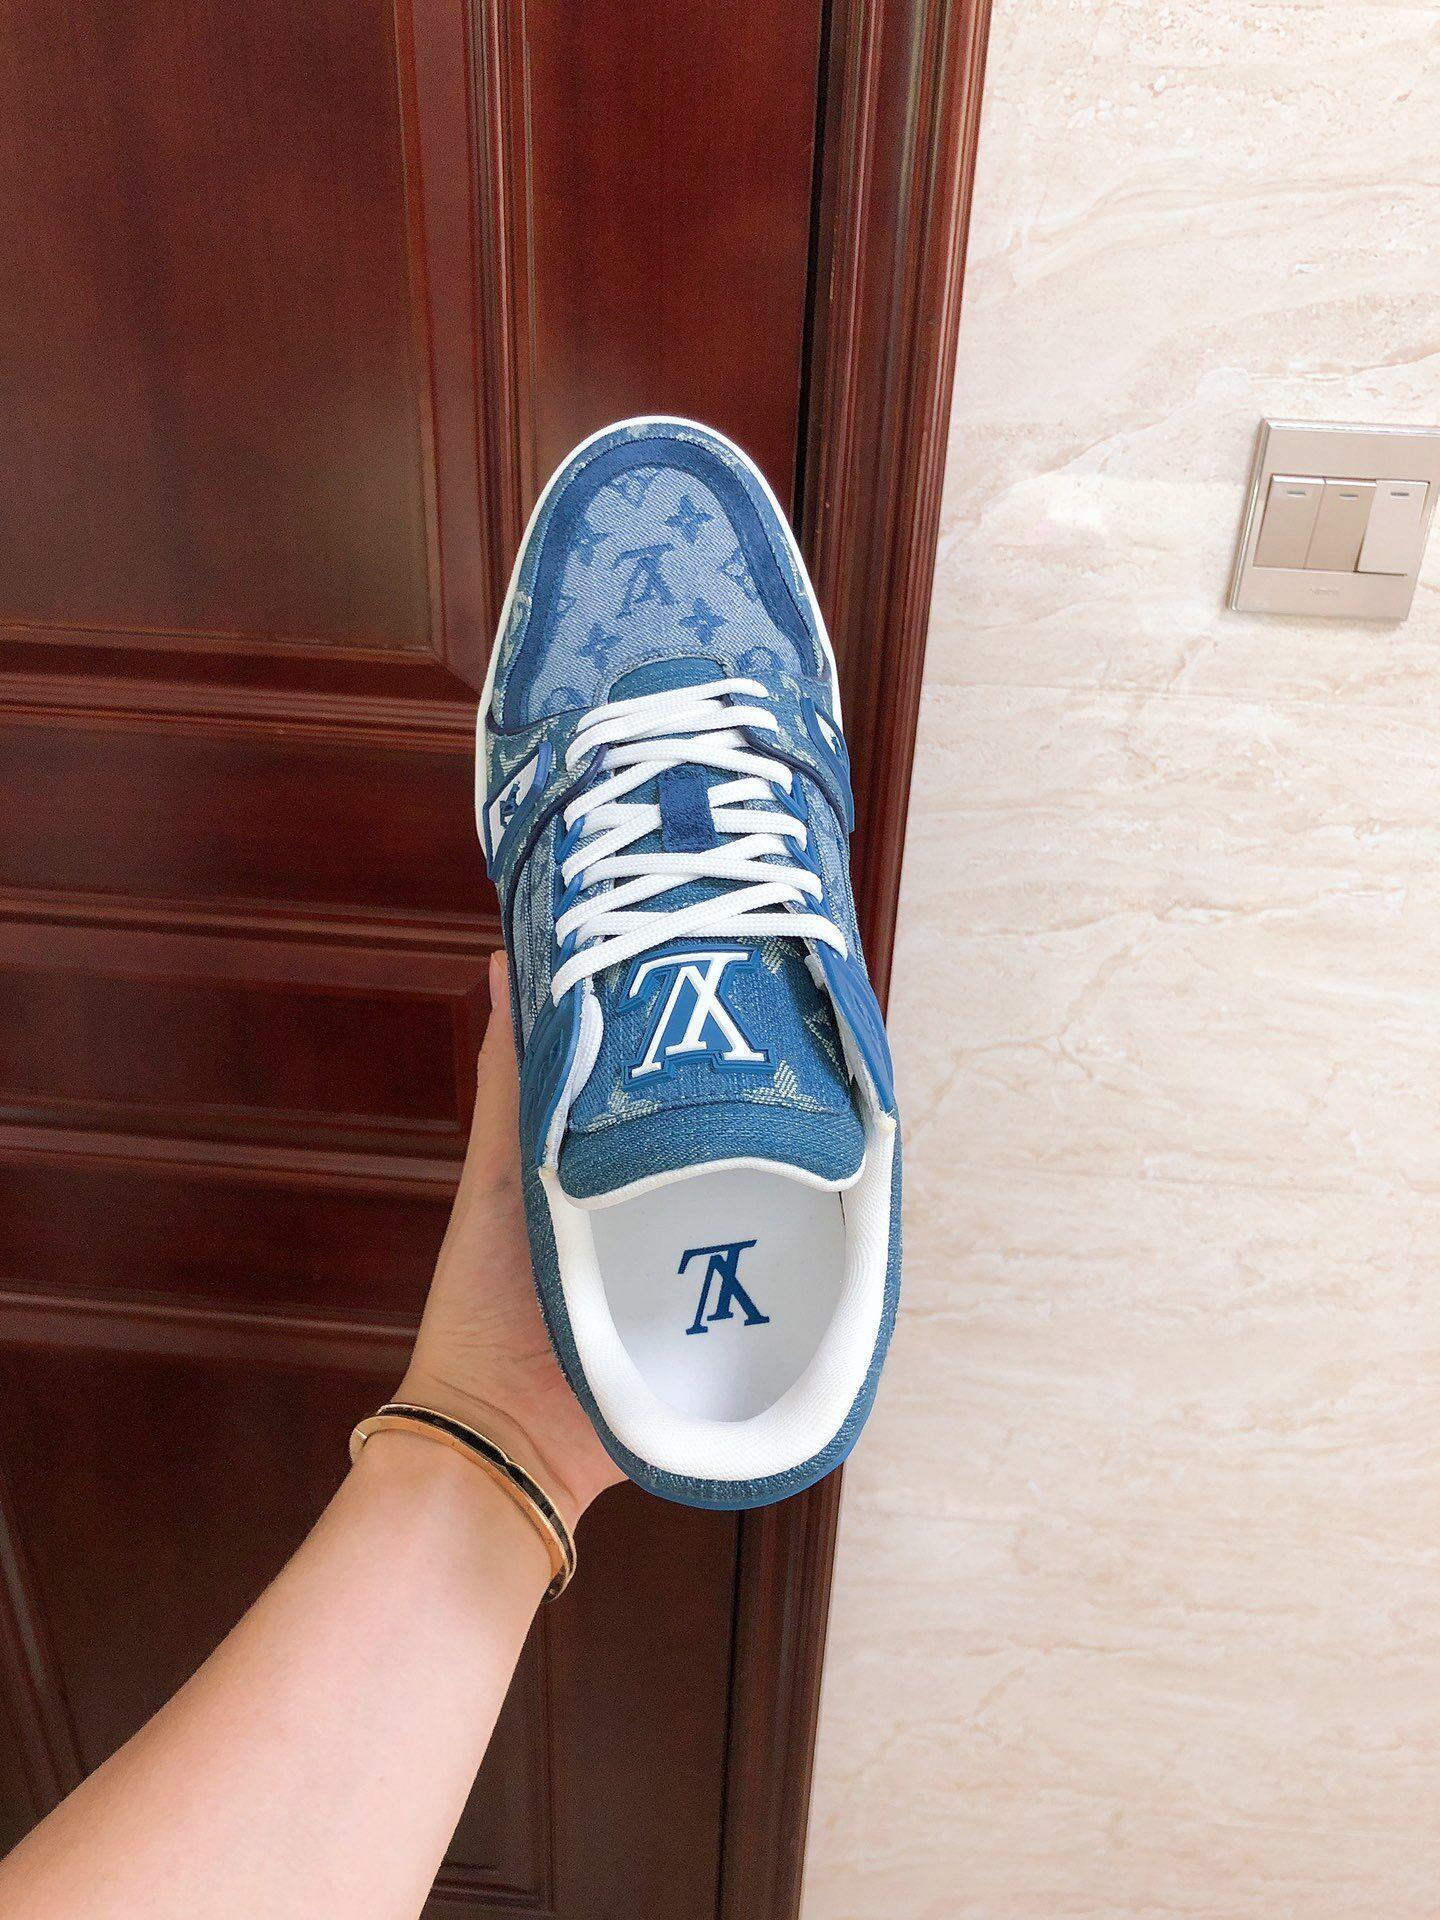 trainer sneaker Blue Monogram denim    sneaker    shoes 1A7S51 9